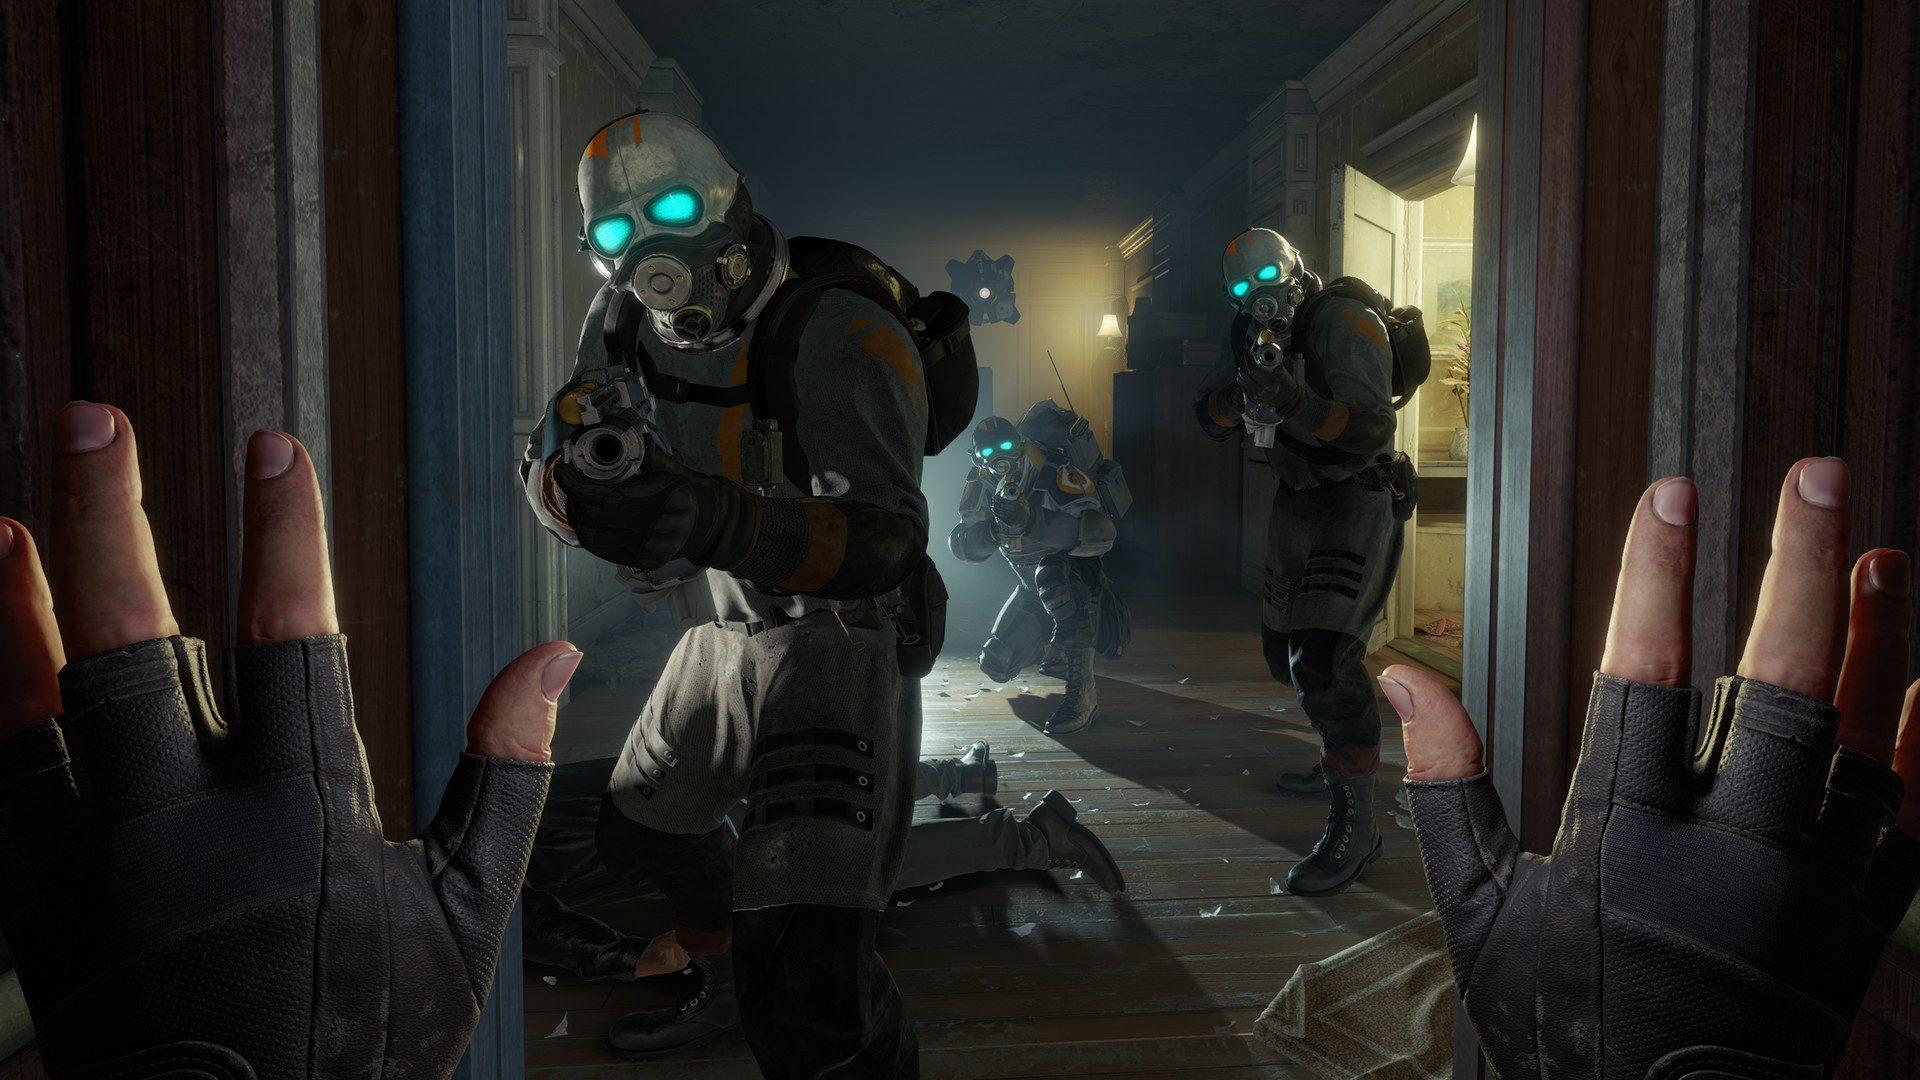 NVIDIA releases 445.75 WHQL drivers ahead of Half-Life: Alyx launch - MSPoweruser - MSPoweruser